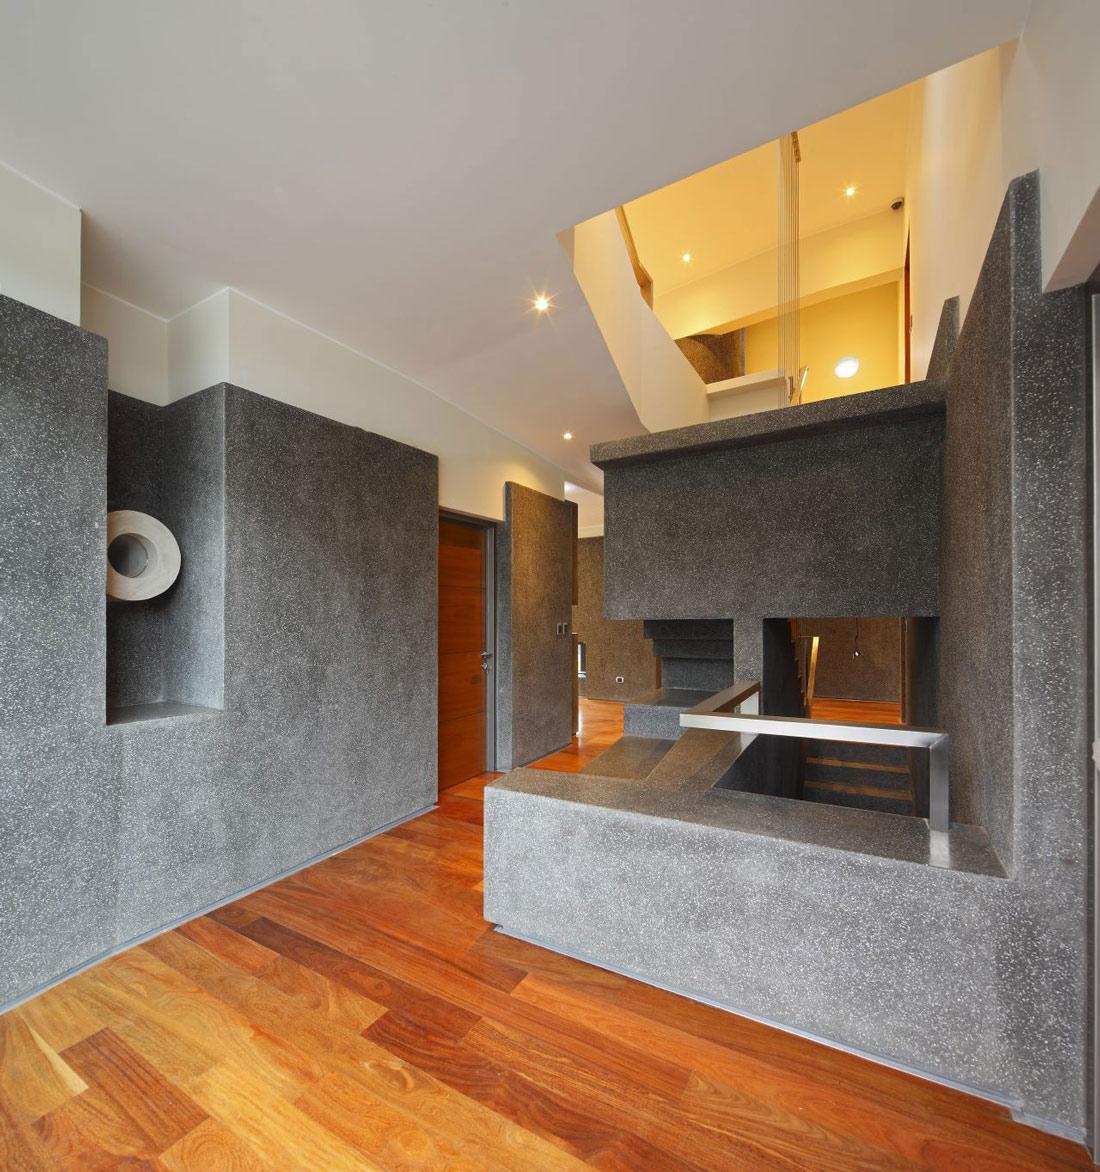 Wood Flooring, Home in La Planicie, Lima